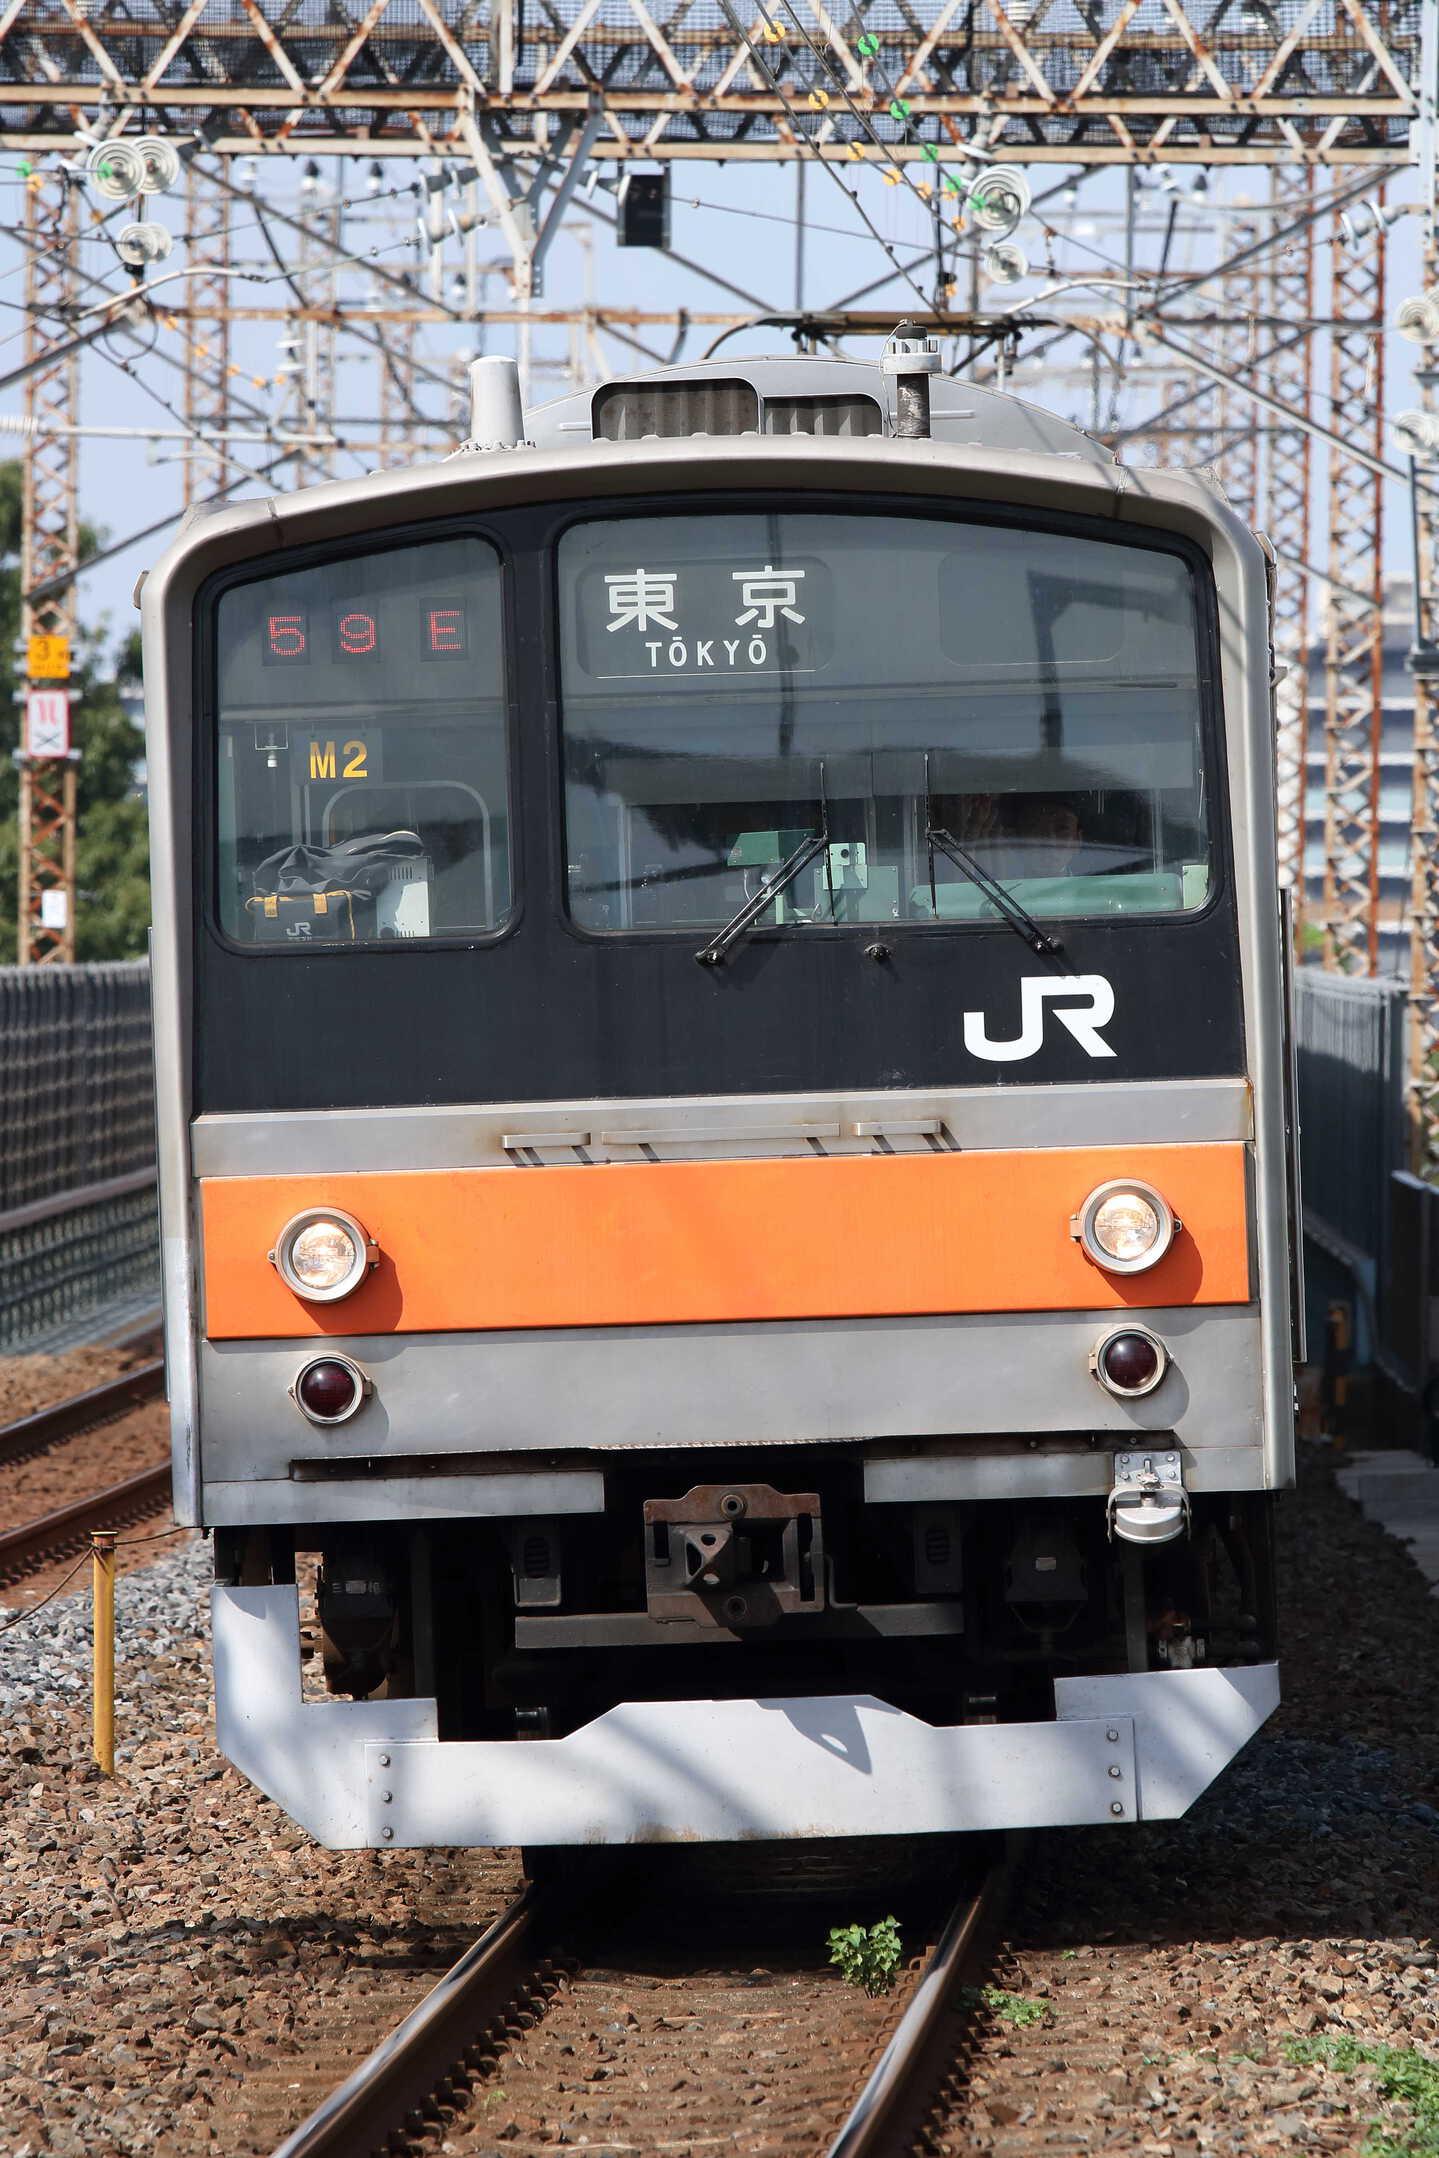 859E 205系 千ケヨM2編成